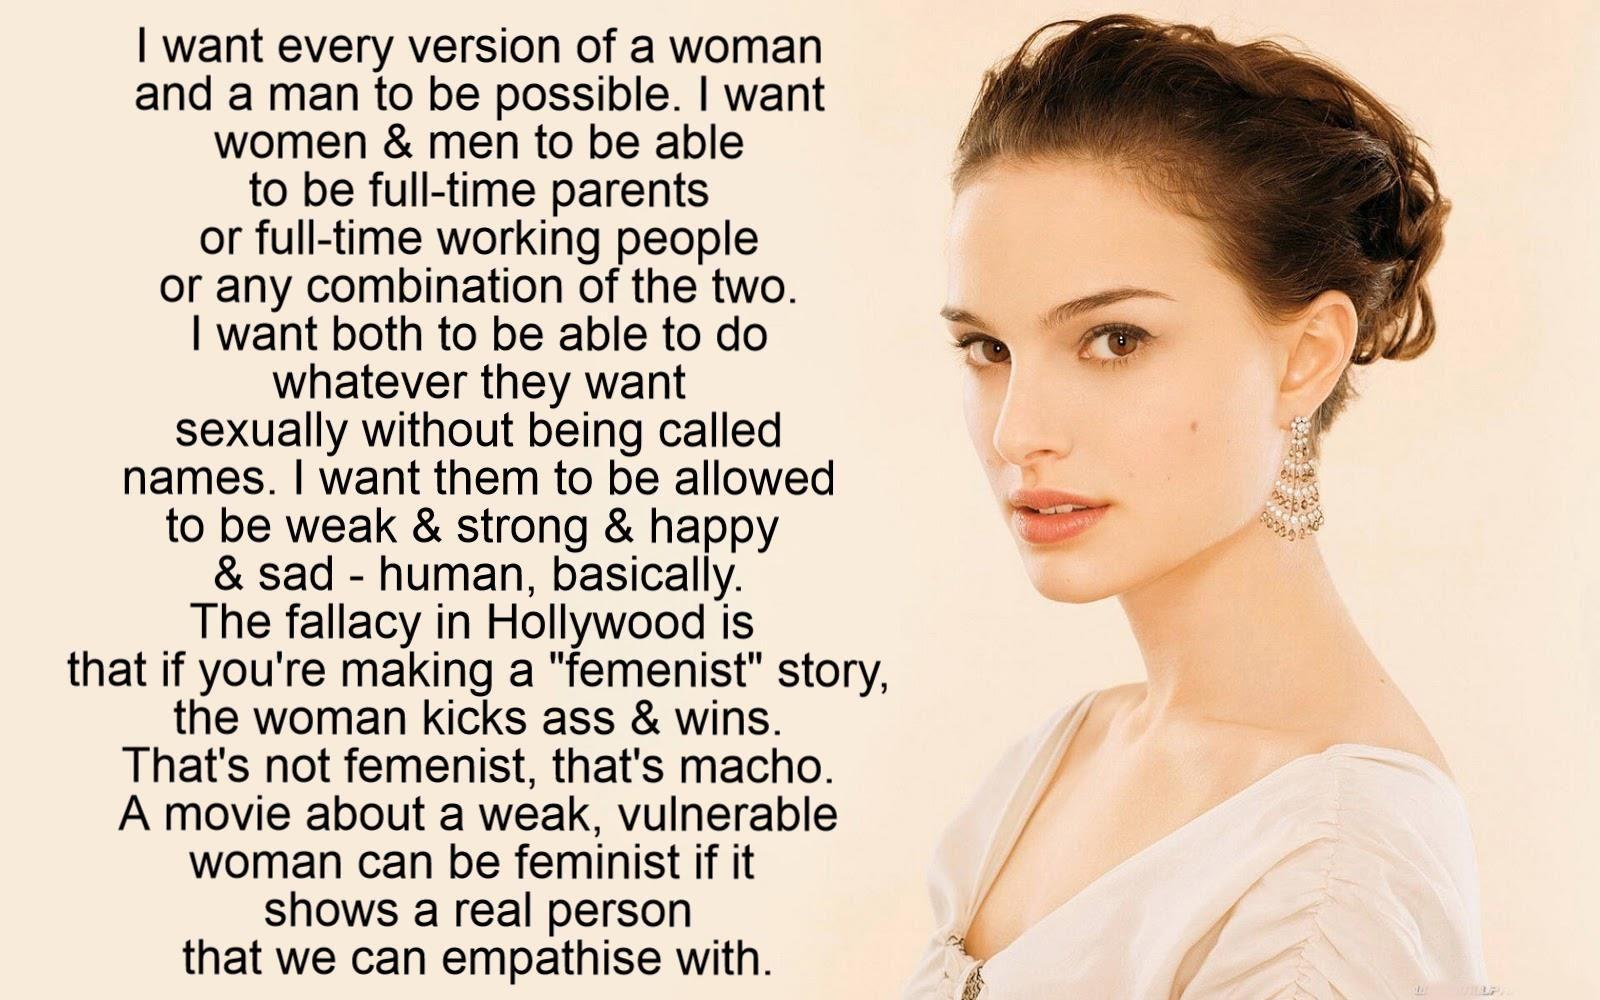 Natalie Portman on femenism  | Interesting People | Feminism